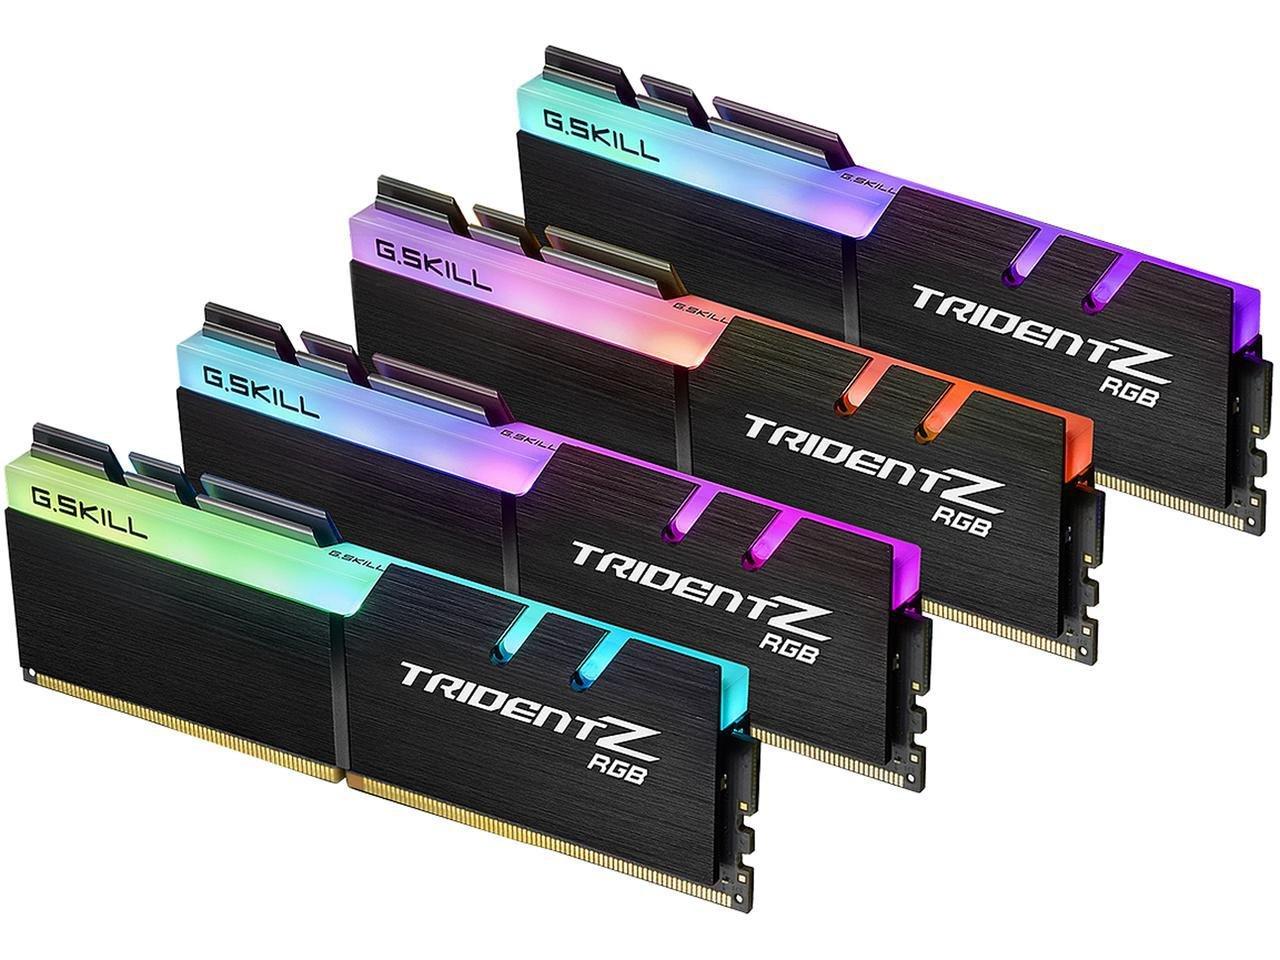 G.SKILL 64GB (4 x 16GB) TridentZ RGB Series DDR4 PC4-27700 3466MHz Desktop Memory Model F4-3466C16Q-64GTZR